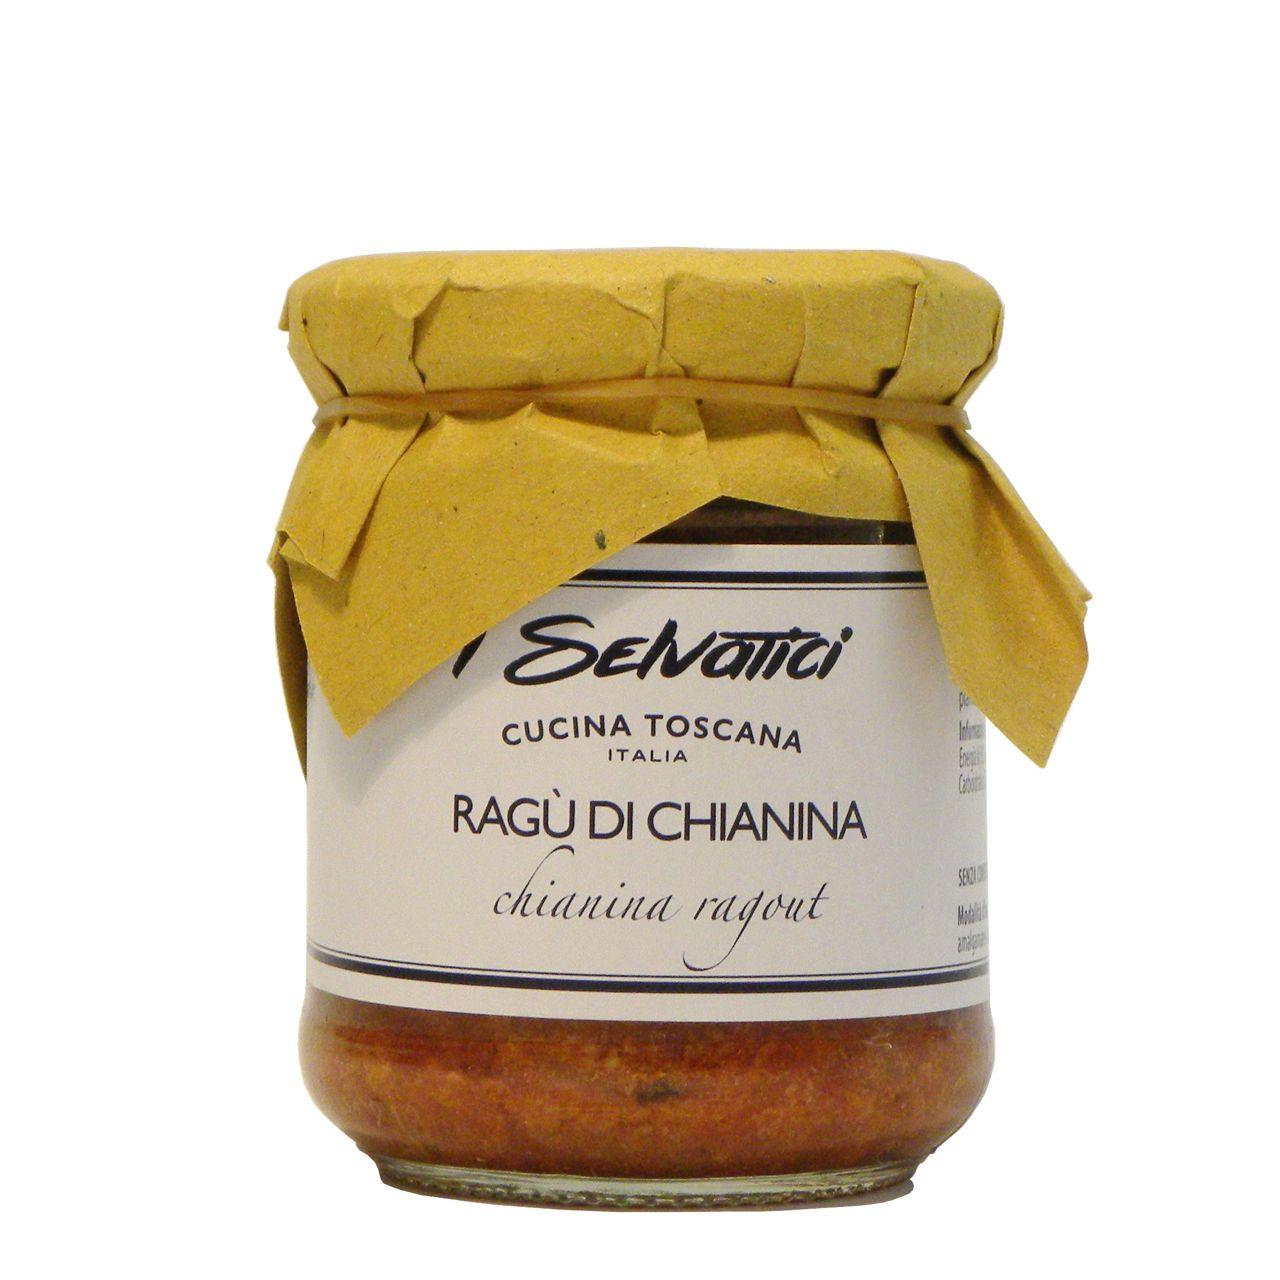 Ragù Chianina – Chianina ragù – Gustorotondo – Italian Food Boutique